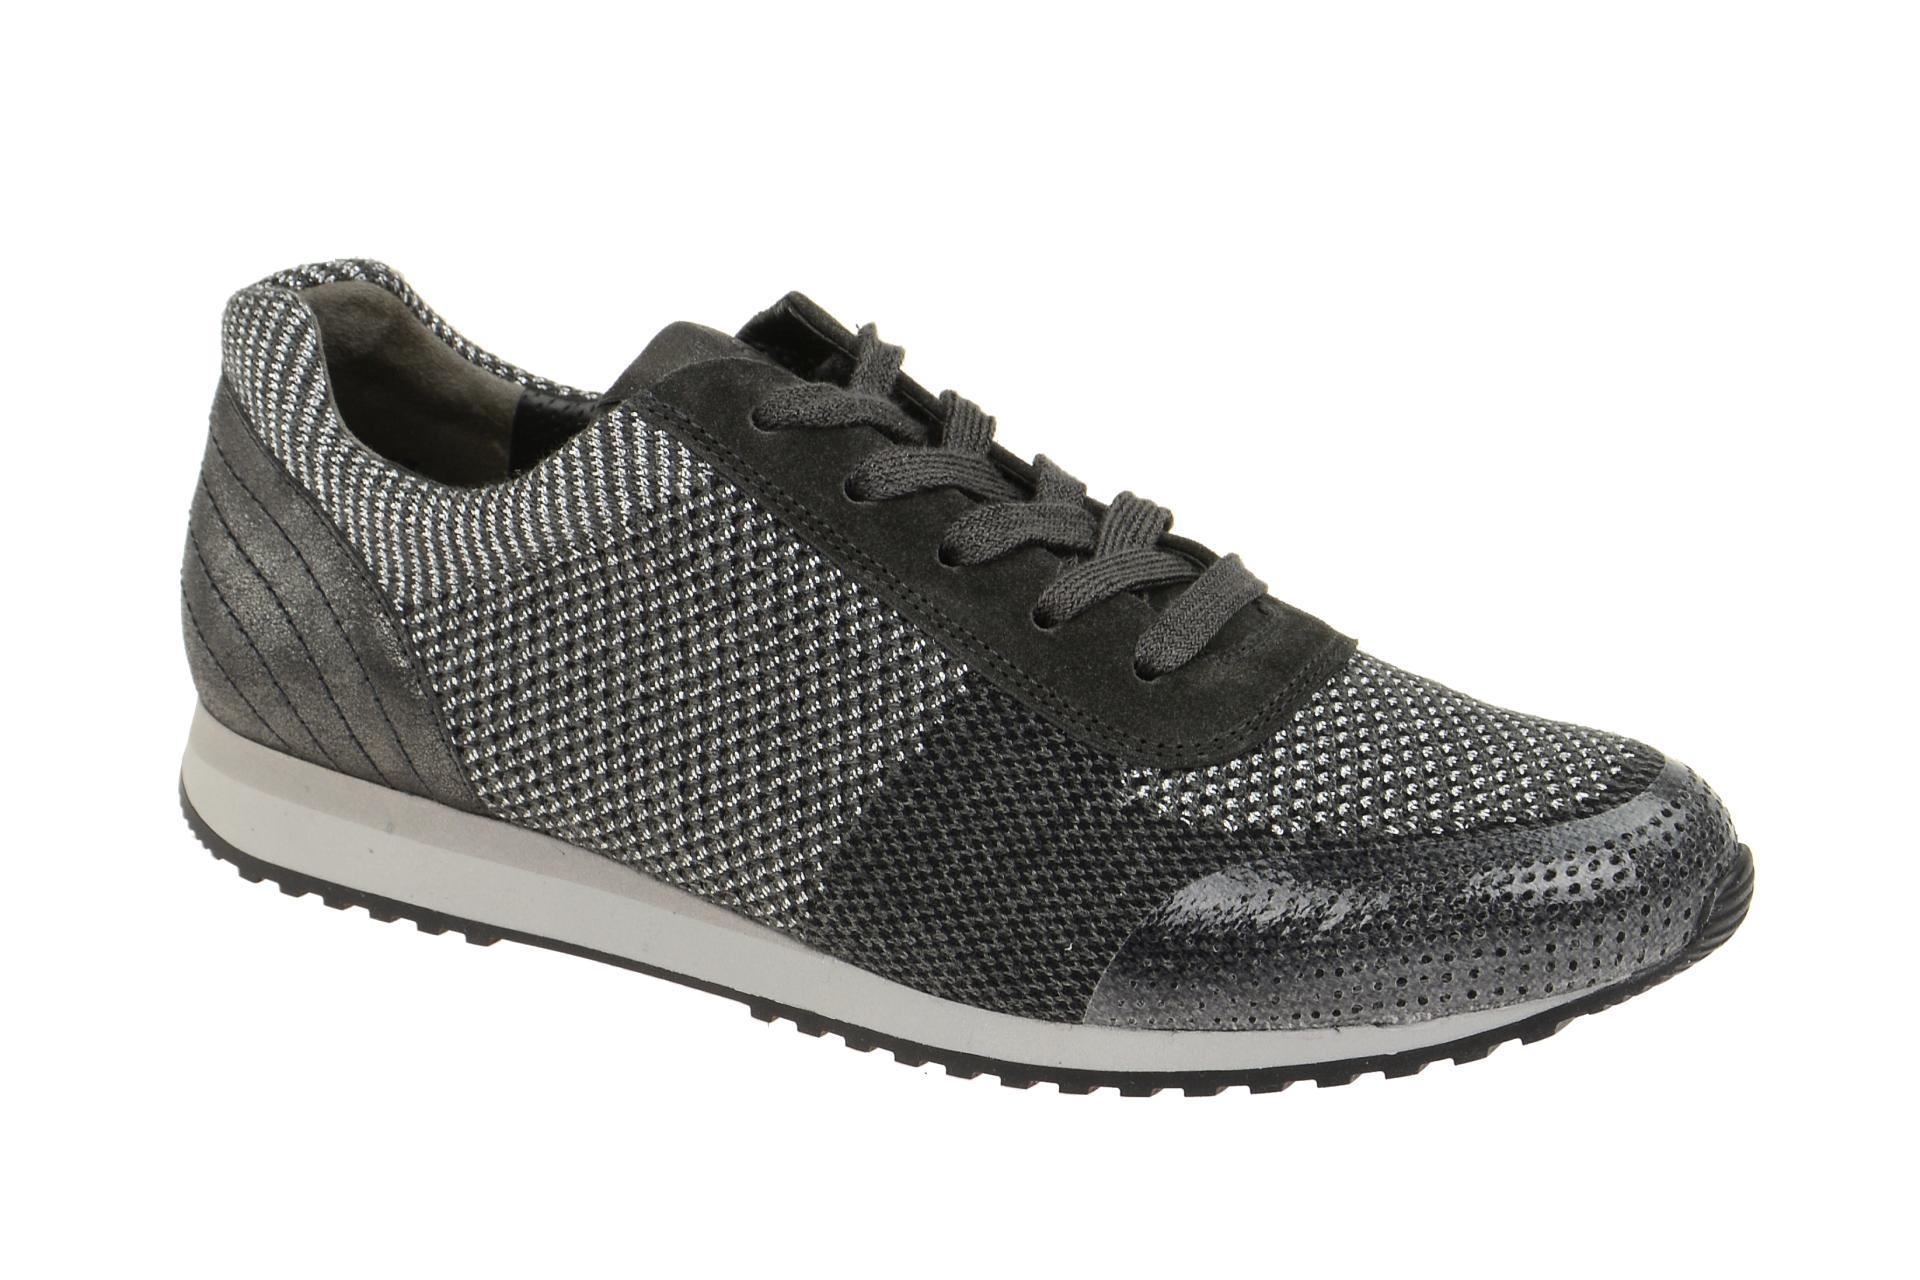 Paul Grün Schuhe 4336 grau Damenschuhe sportliche Schnür-Halbschuhe 4336-098